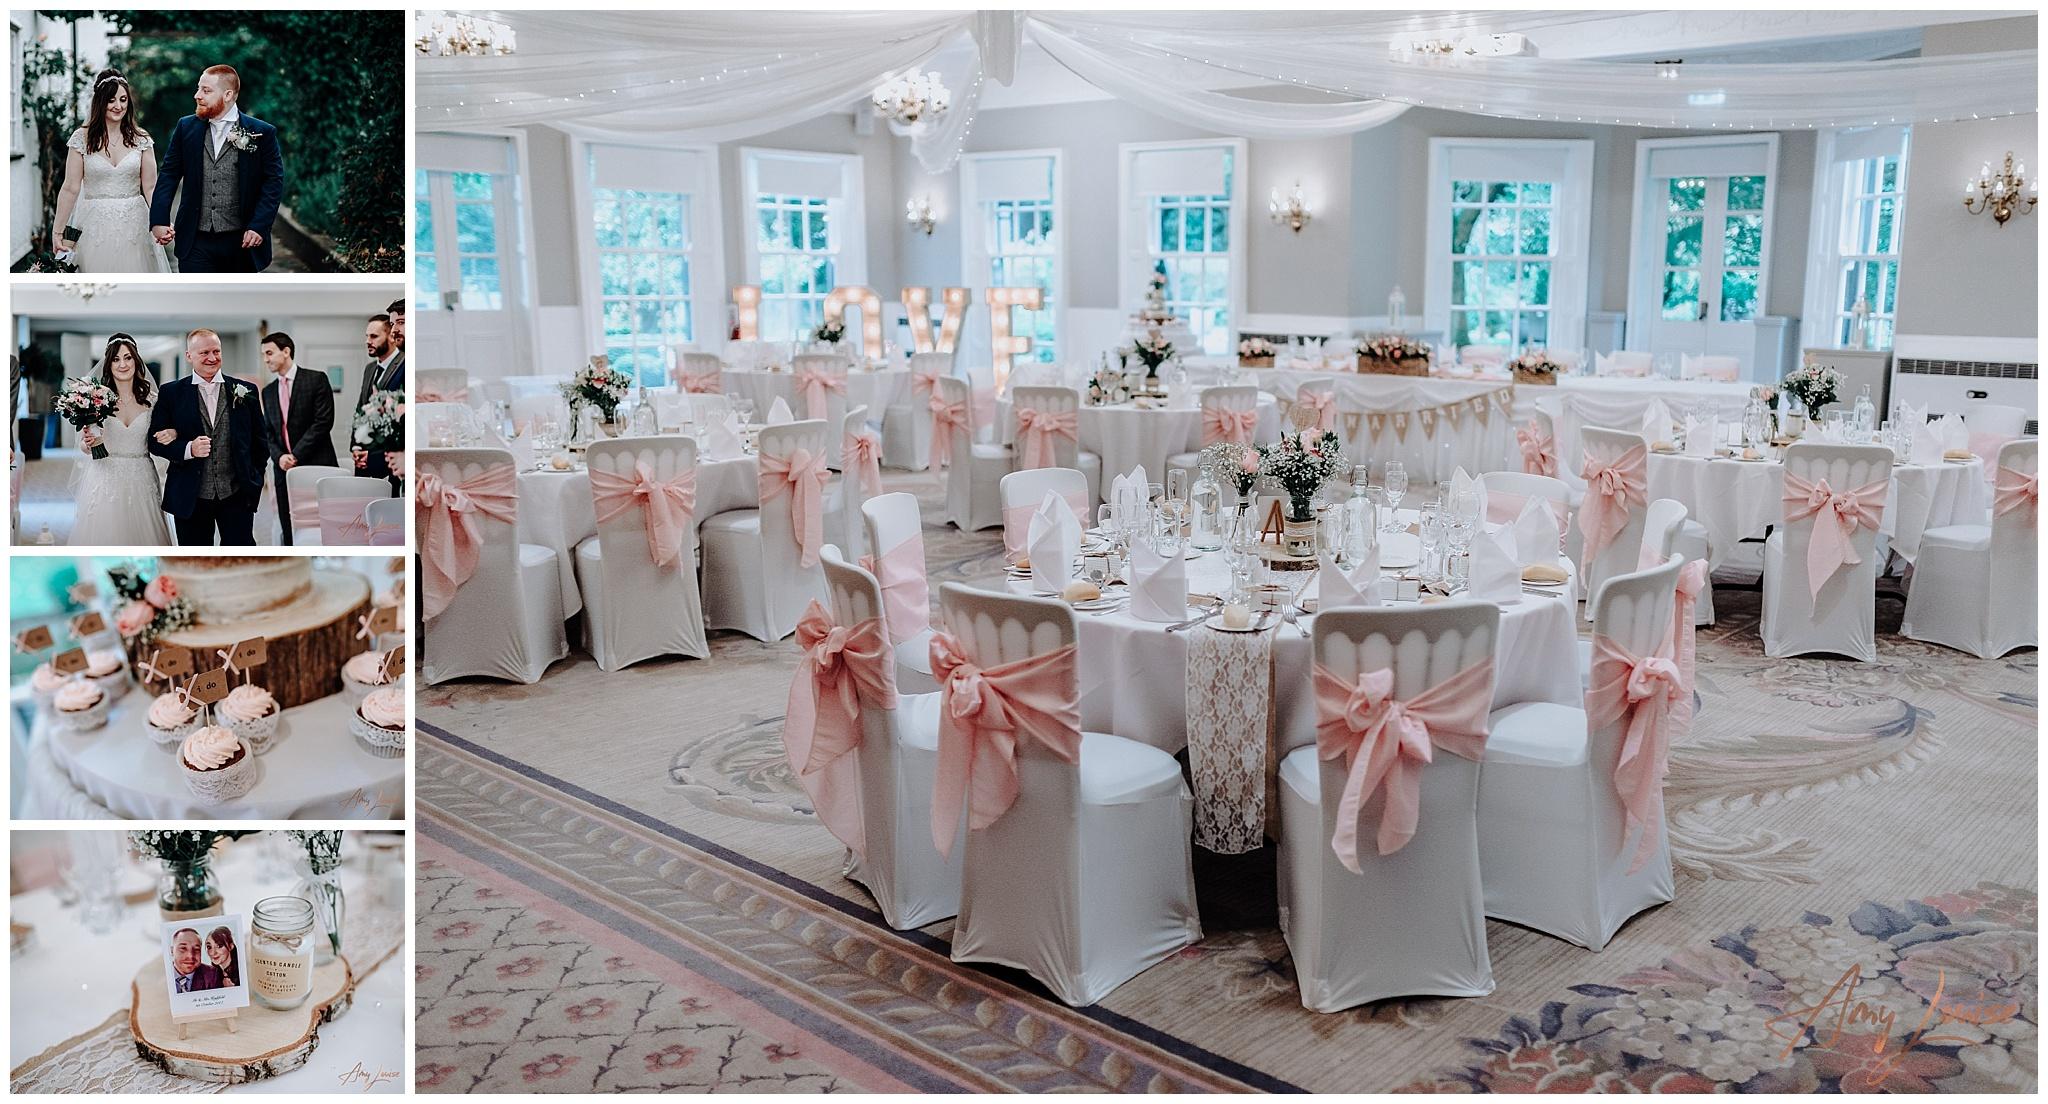 Statham Lodge Wedding Venue